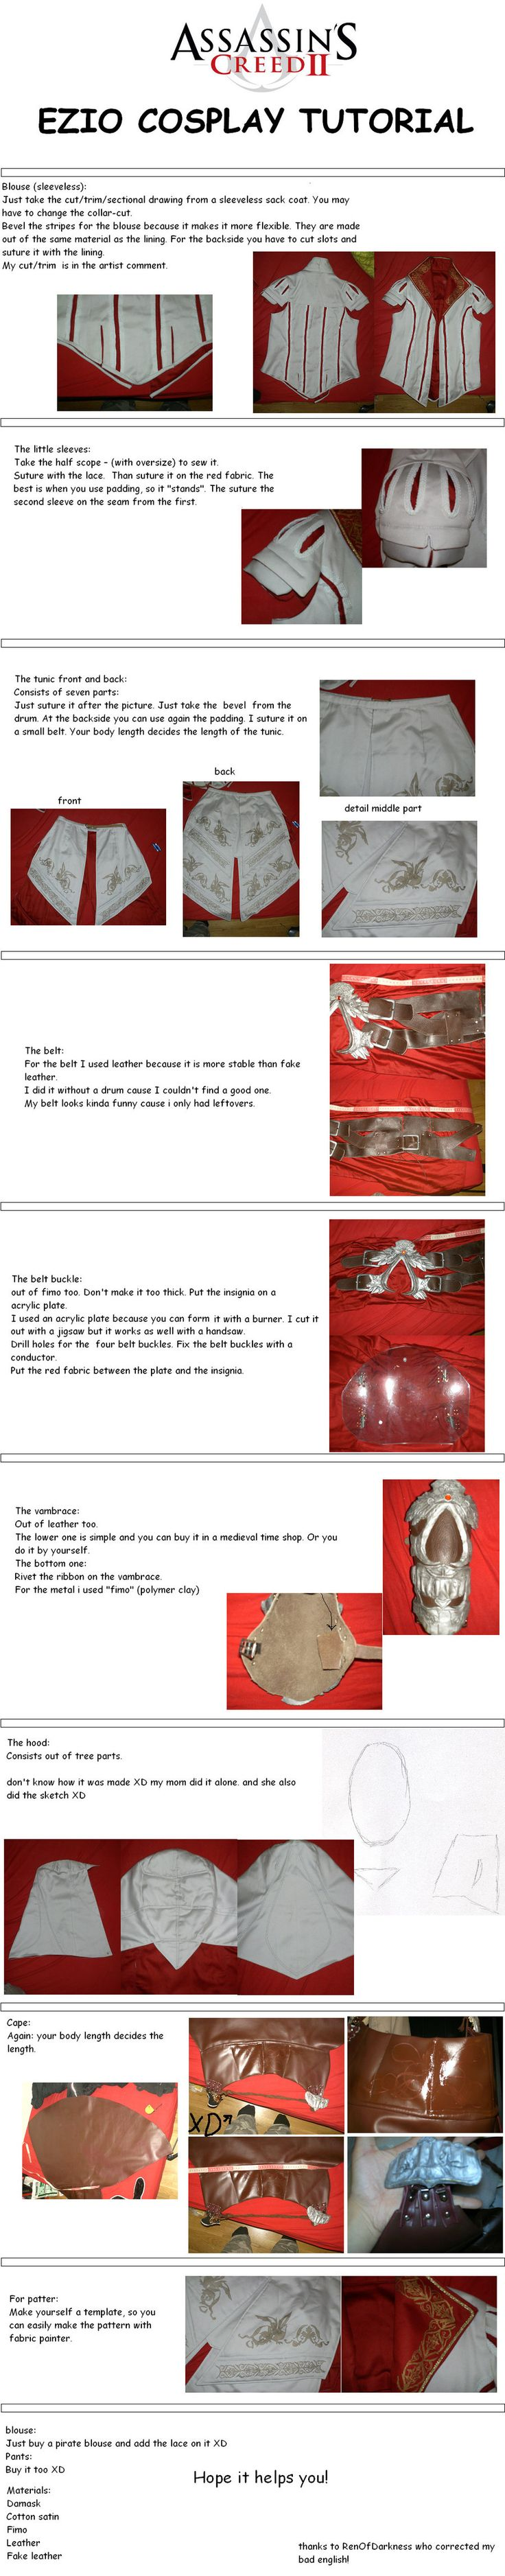 EZIO COSPLAY TUTORIAL -ENGLISH by LadyBad.deviantart.com on @deviantART